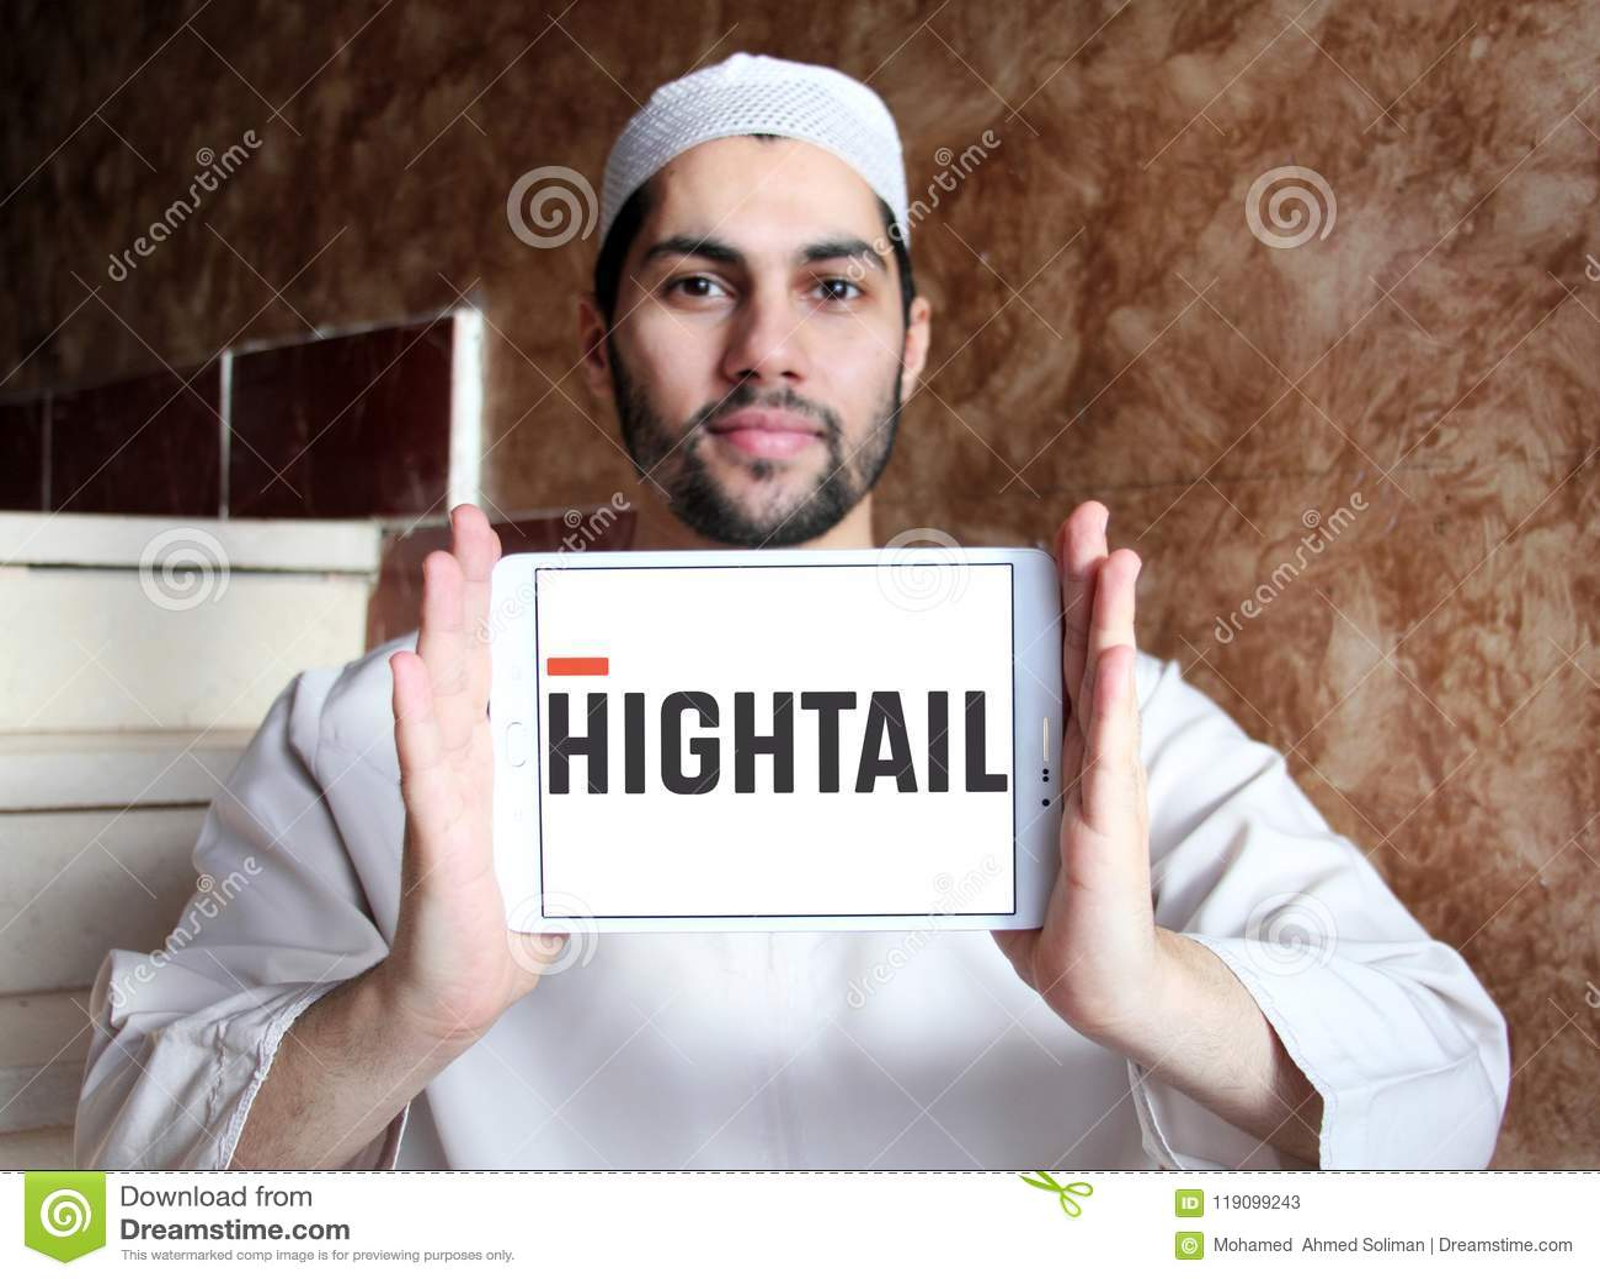 Hightail technology logo editorial stock photo  Image of